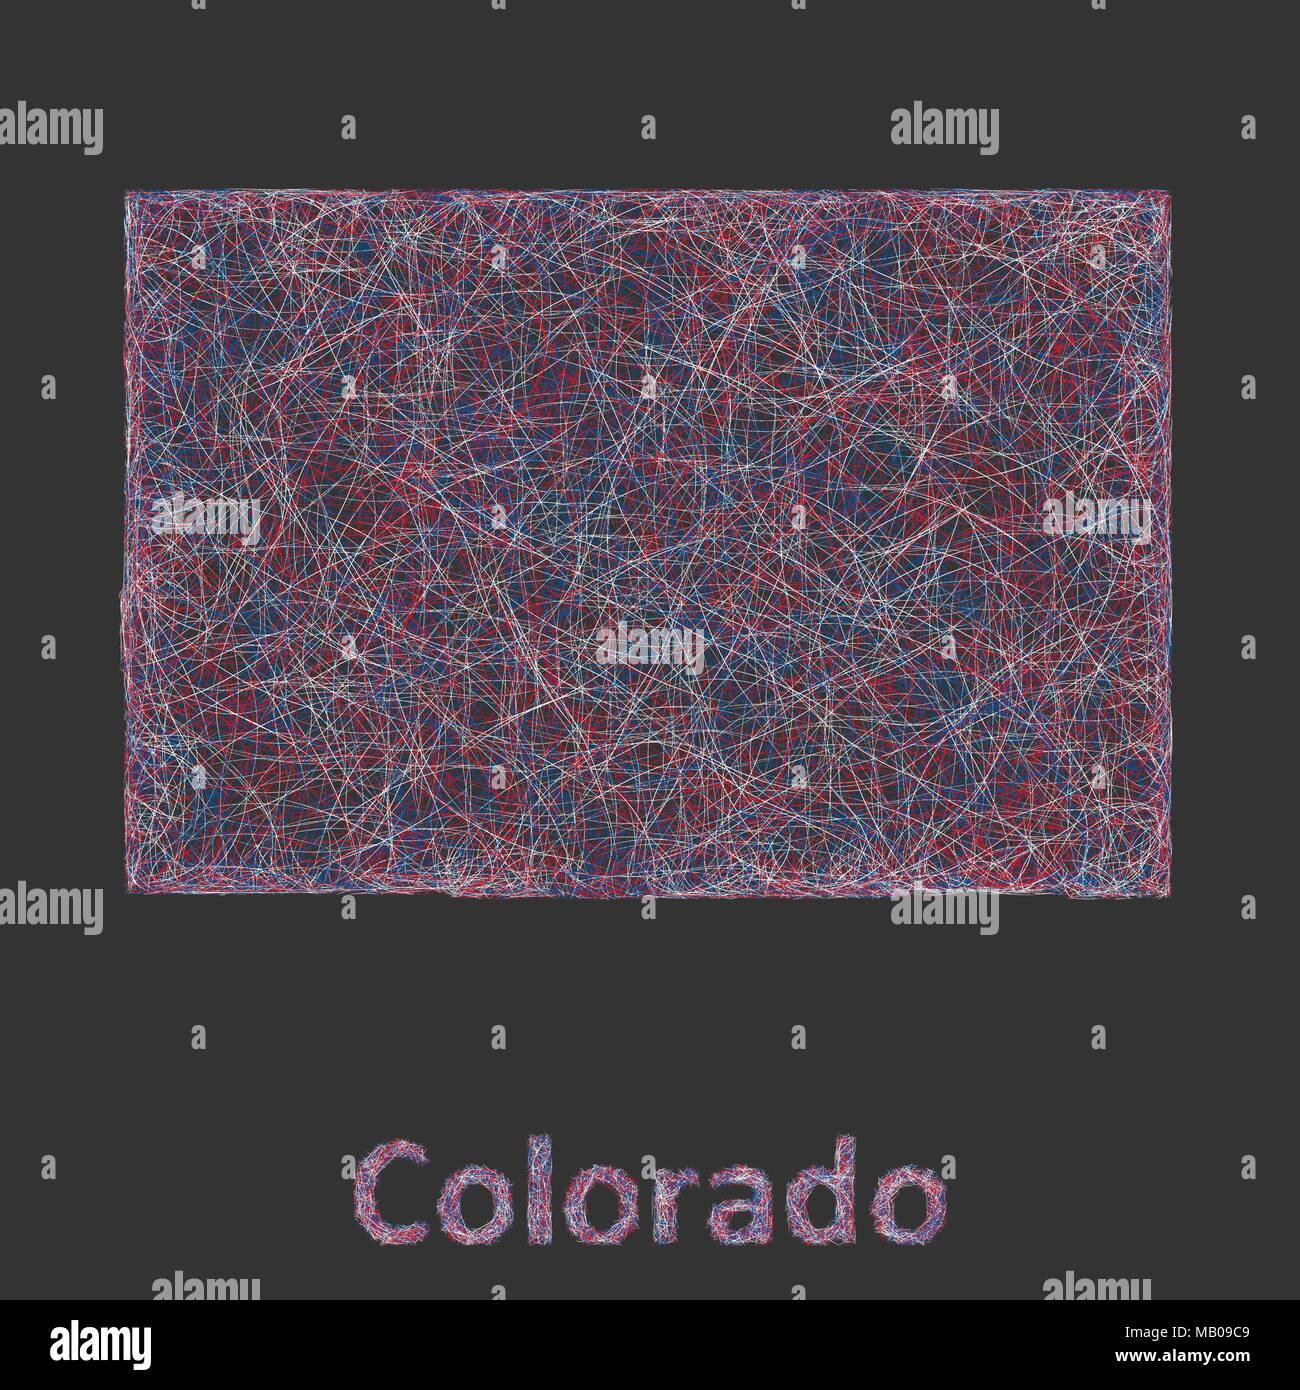 Colorado Map Art.Colorado Line Art Map Stock Vector Art Illustration Vector Image